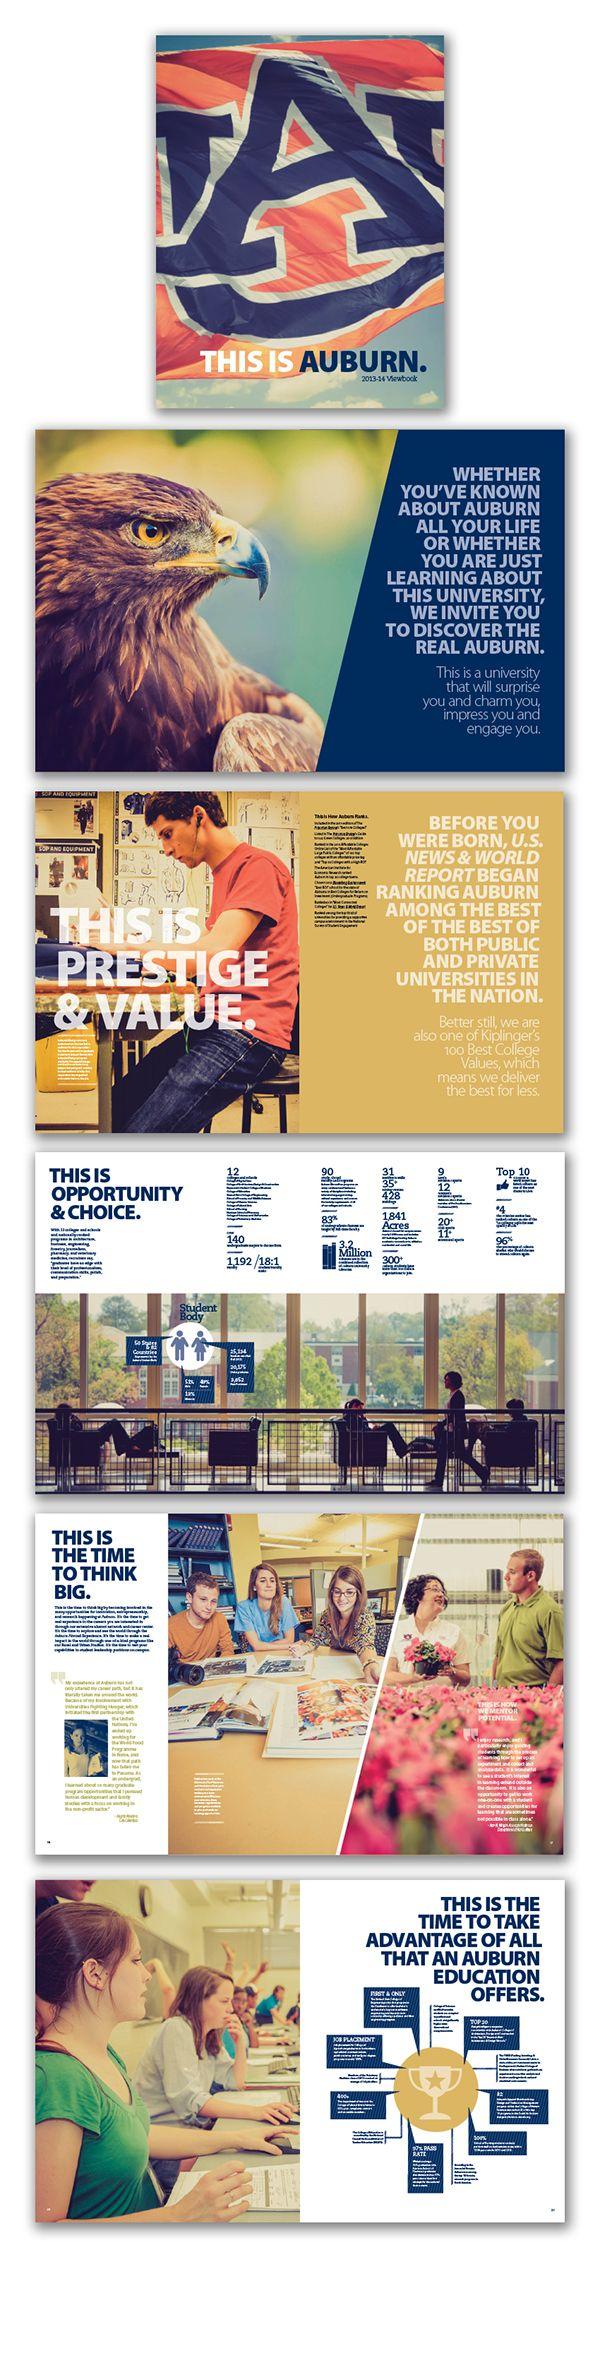 Auburn University Viewbook for prospective undergraduate students